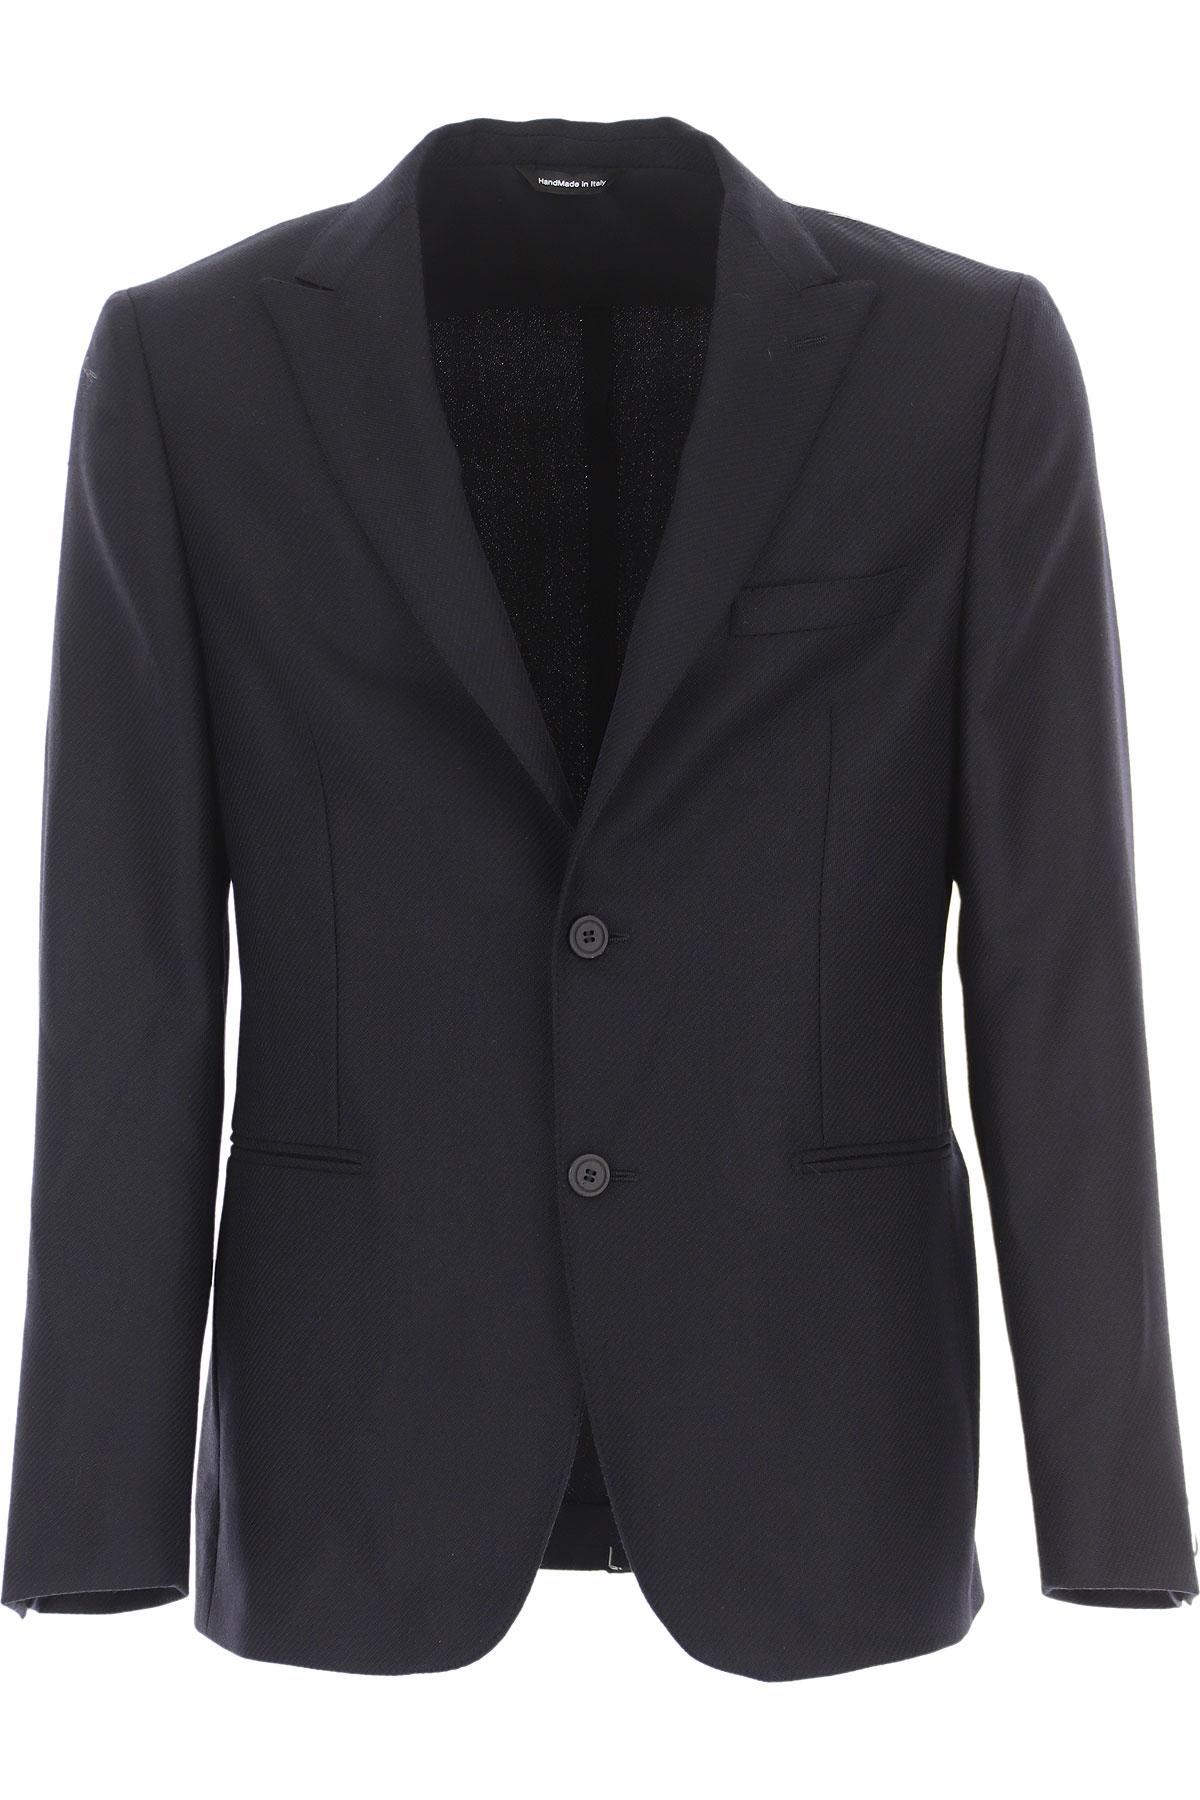 Tonello Blazer for Men, Sport Coat On Sale, navy, Virgin wool, 2019, L M XL XXL